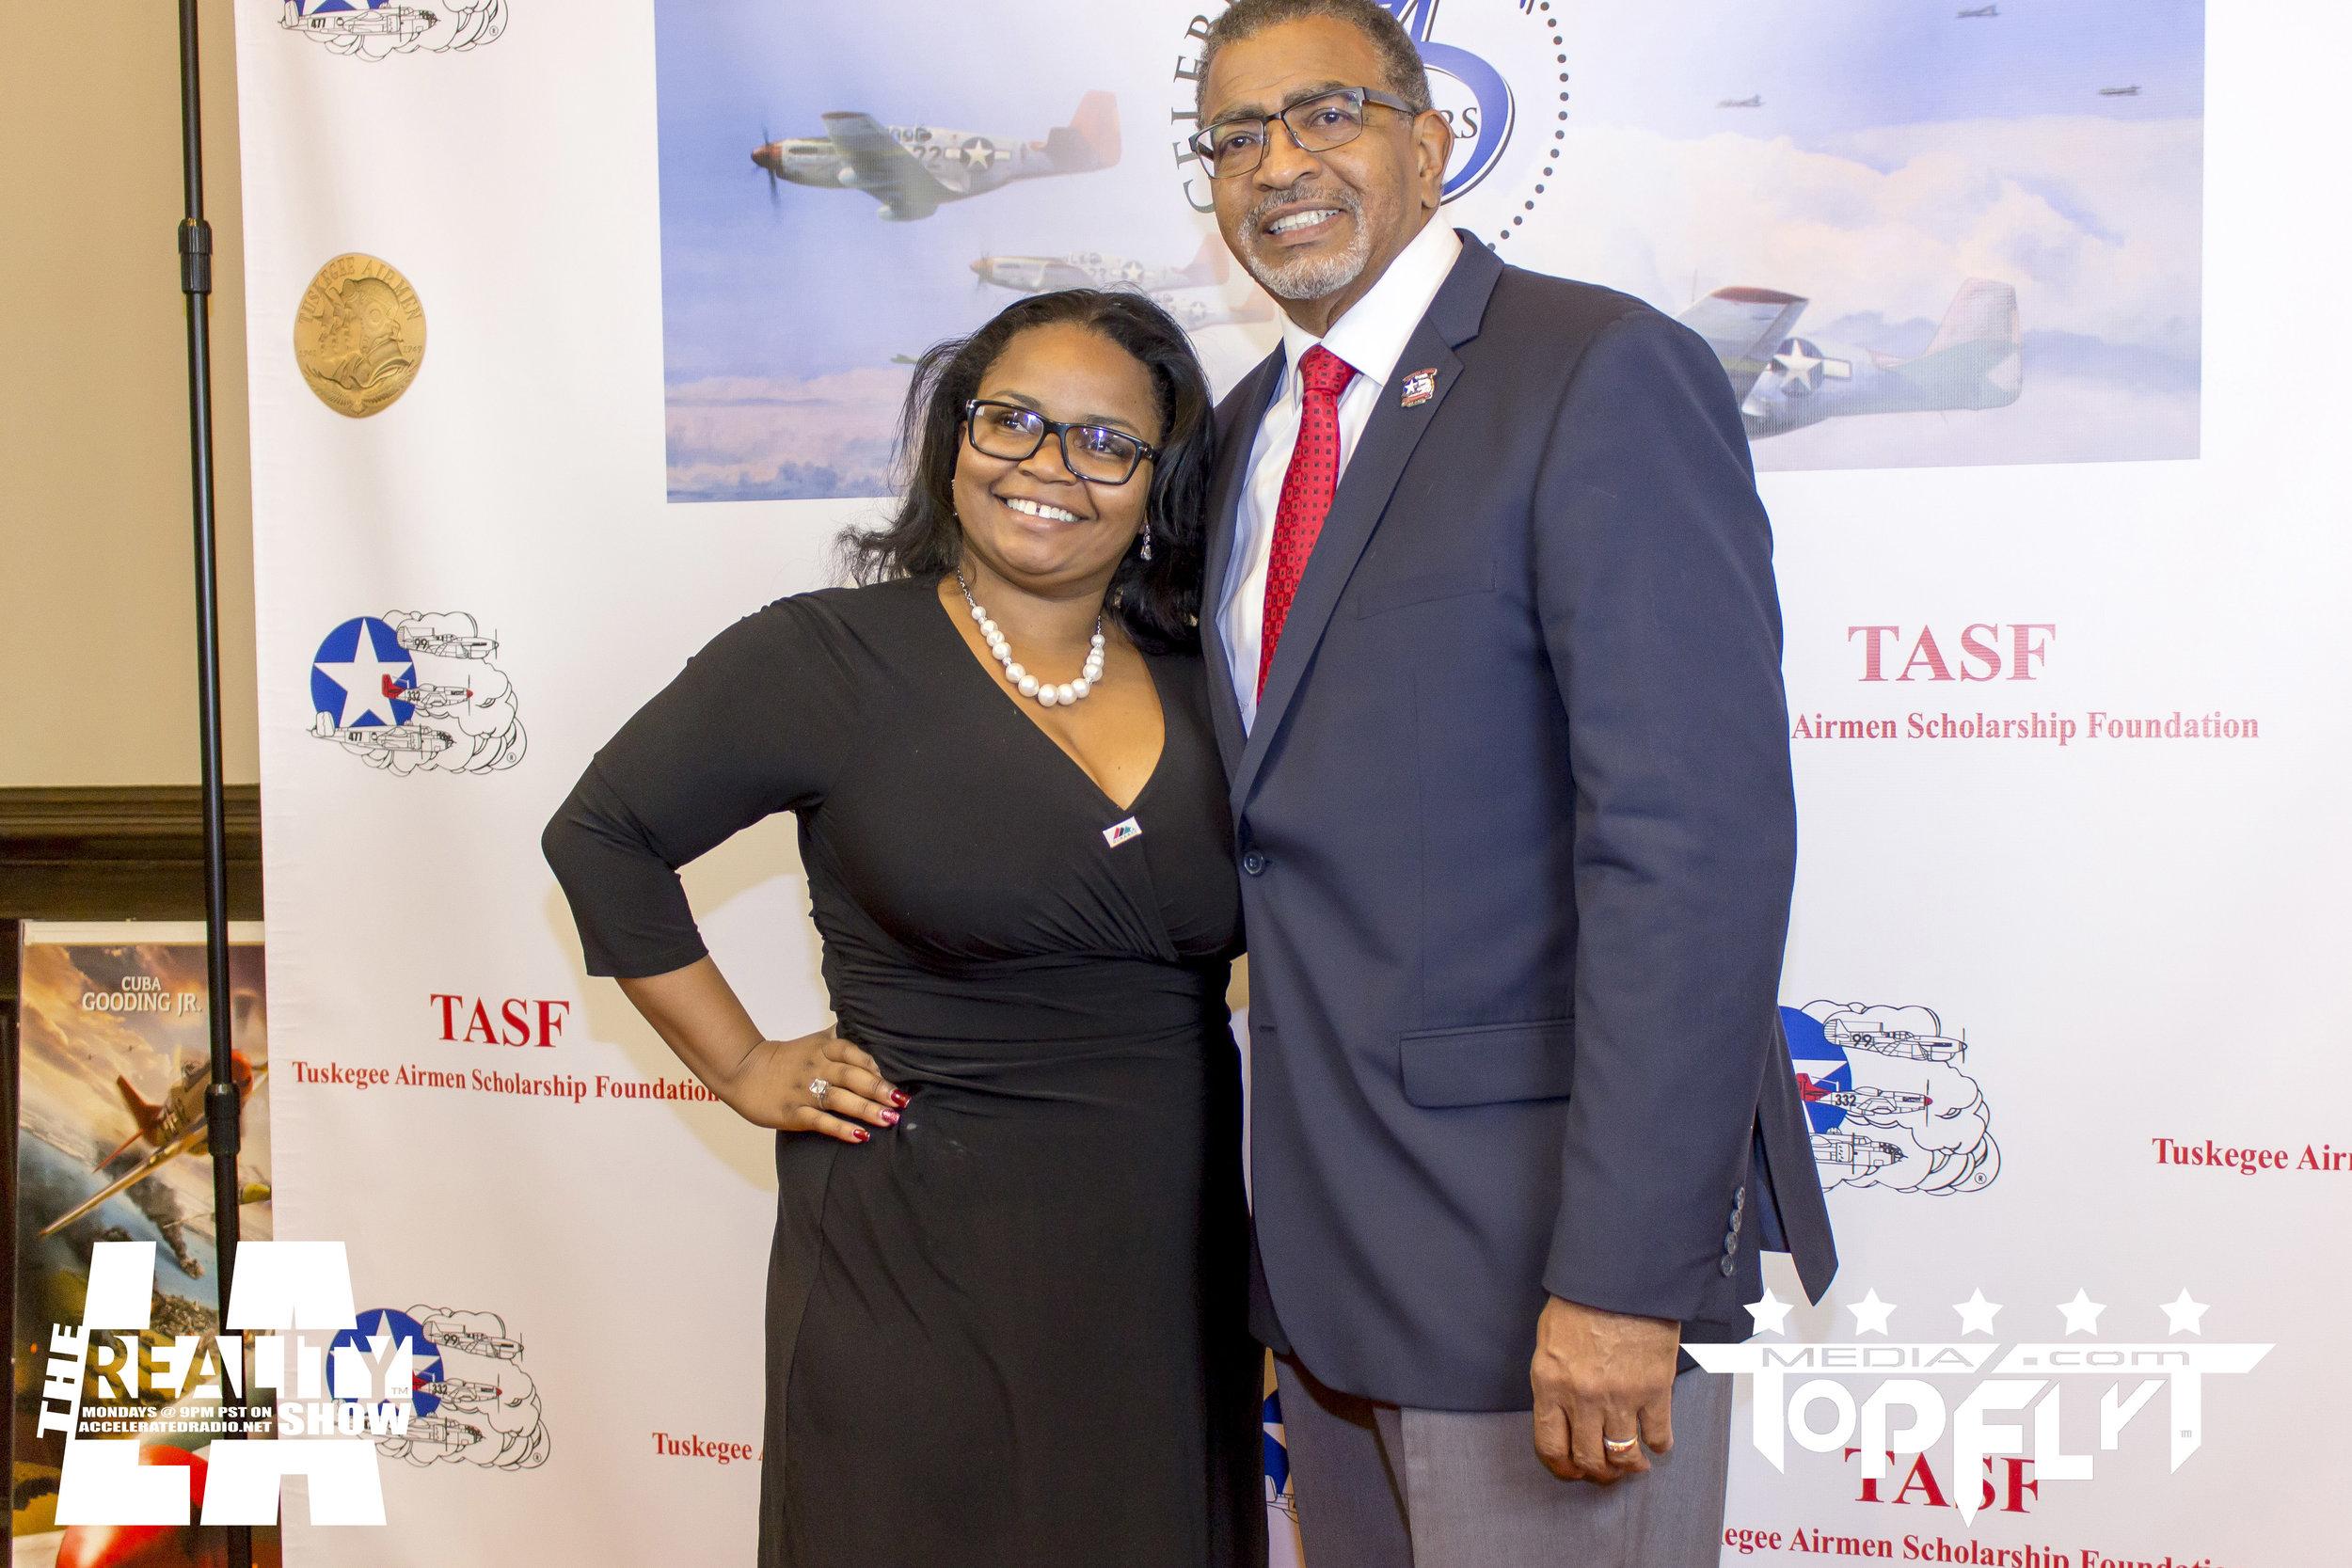 The Reality Show LA - Tuskegee Airmen 75th Anniversary VIP Reception_106.jpg